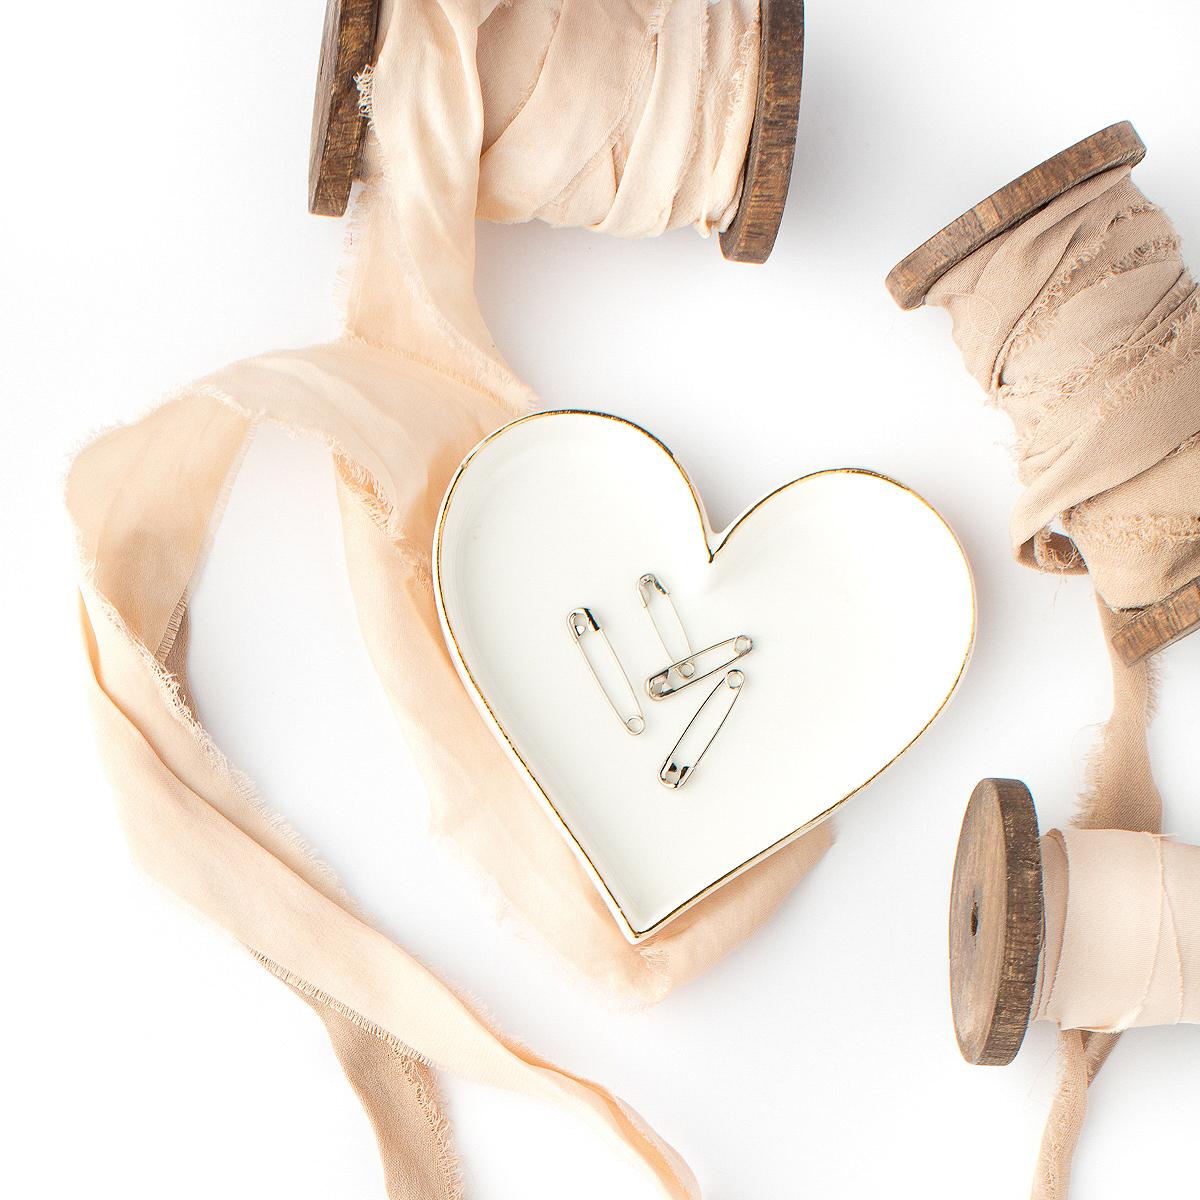 Rag Ribbon Spools and Heart.JPG